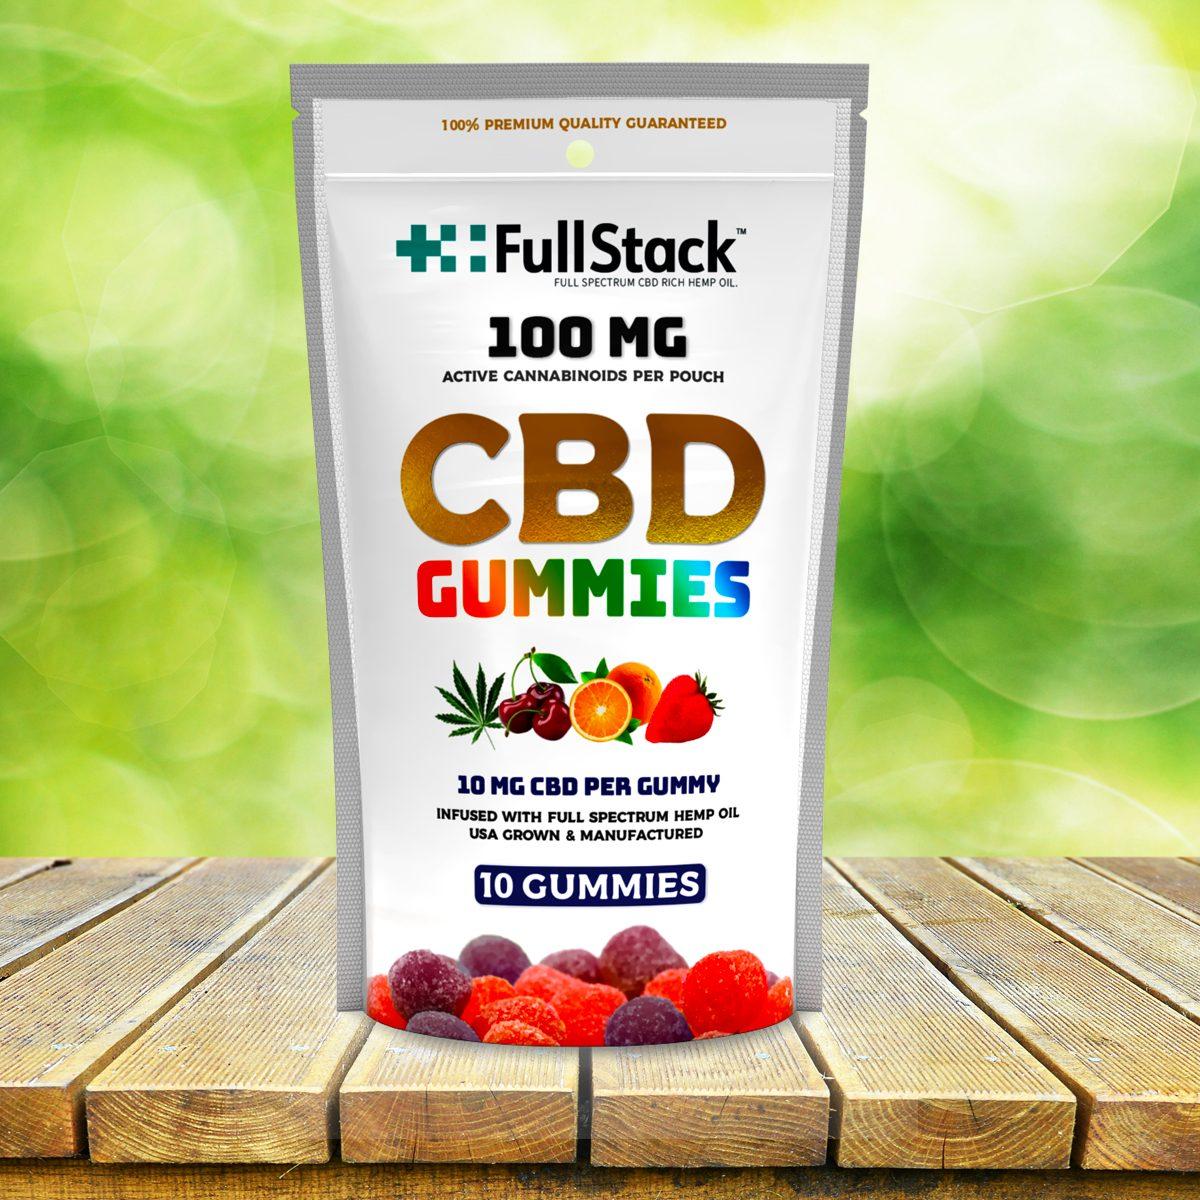 fullstack cbd gummies 10 pack 100mg